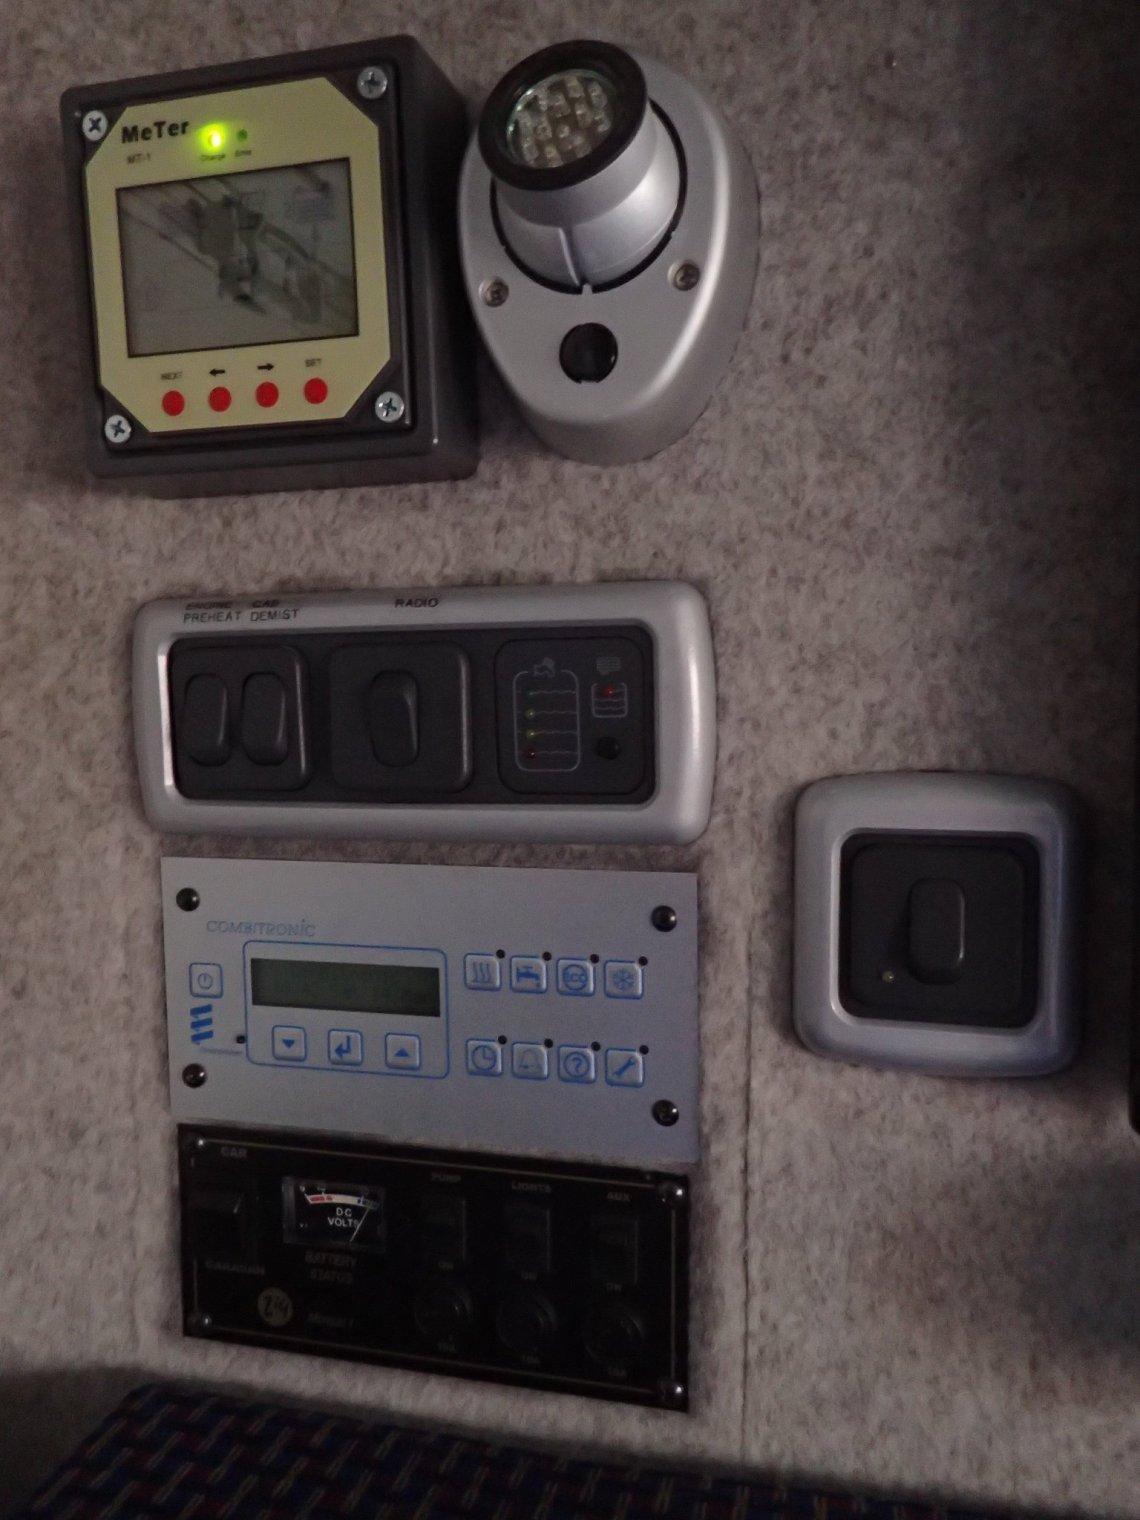 Control panels and LED light